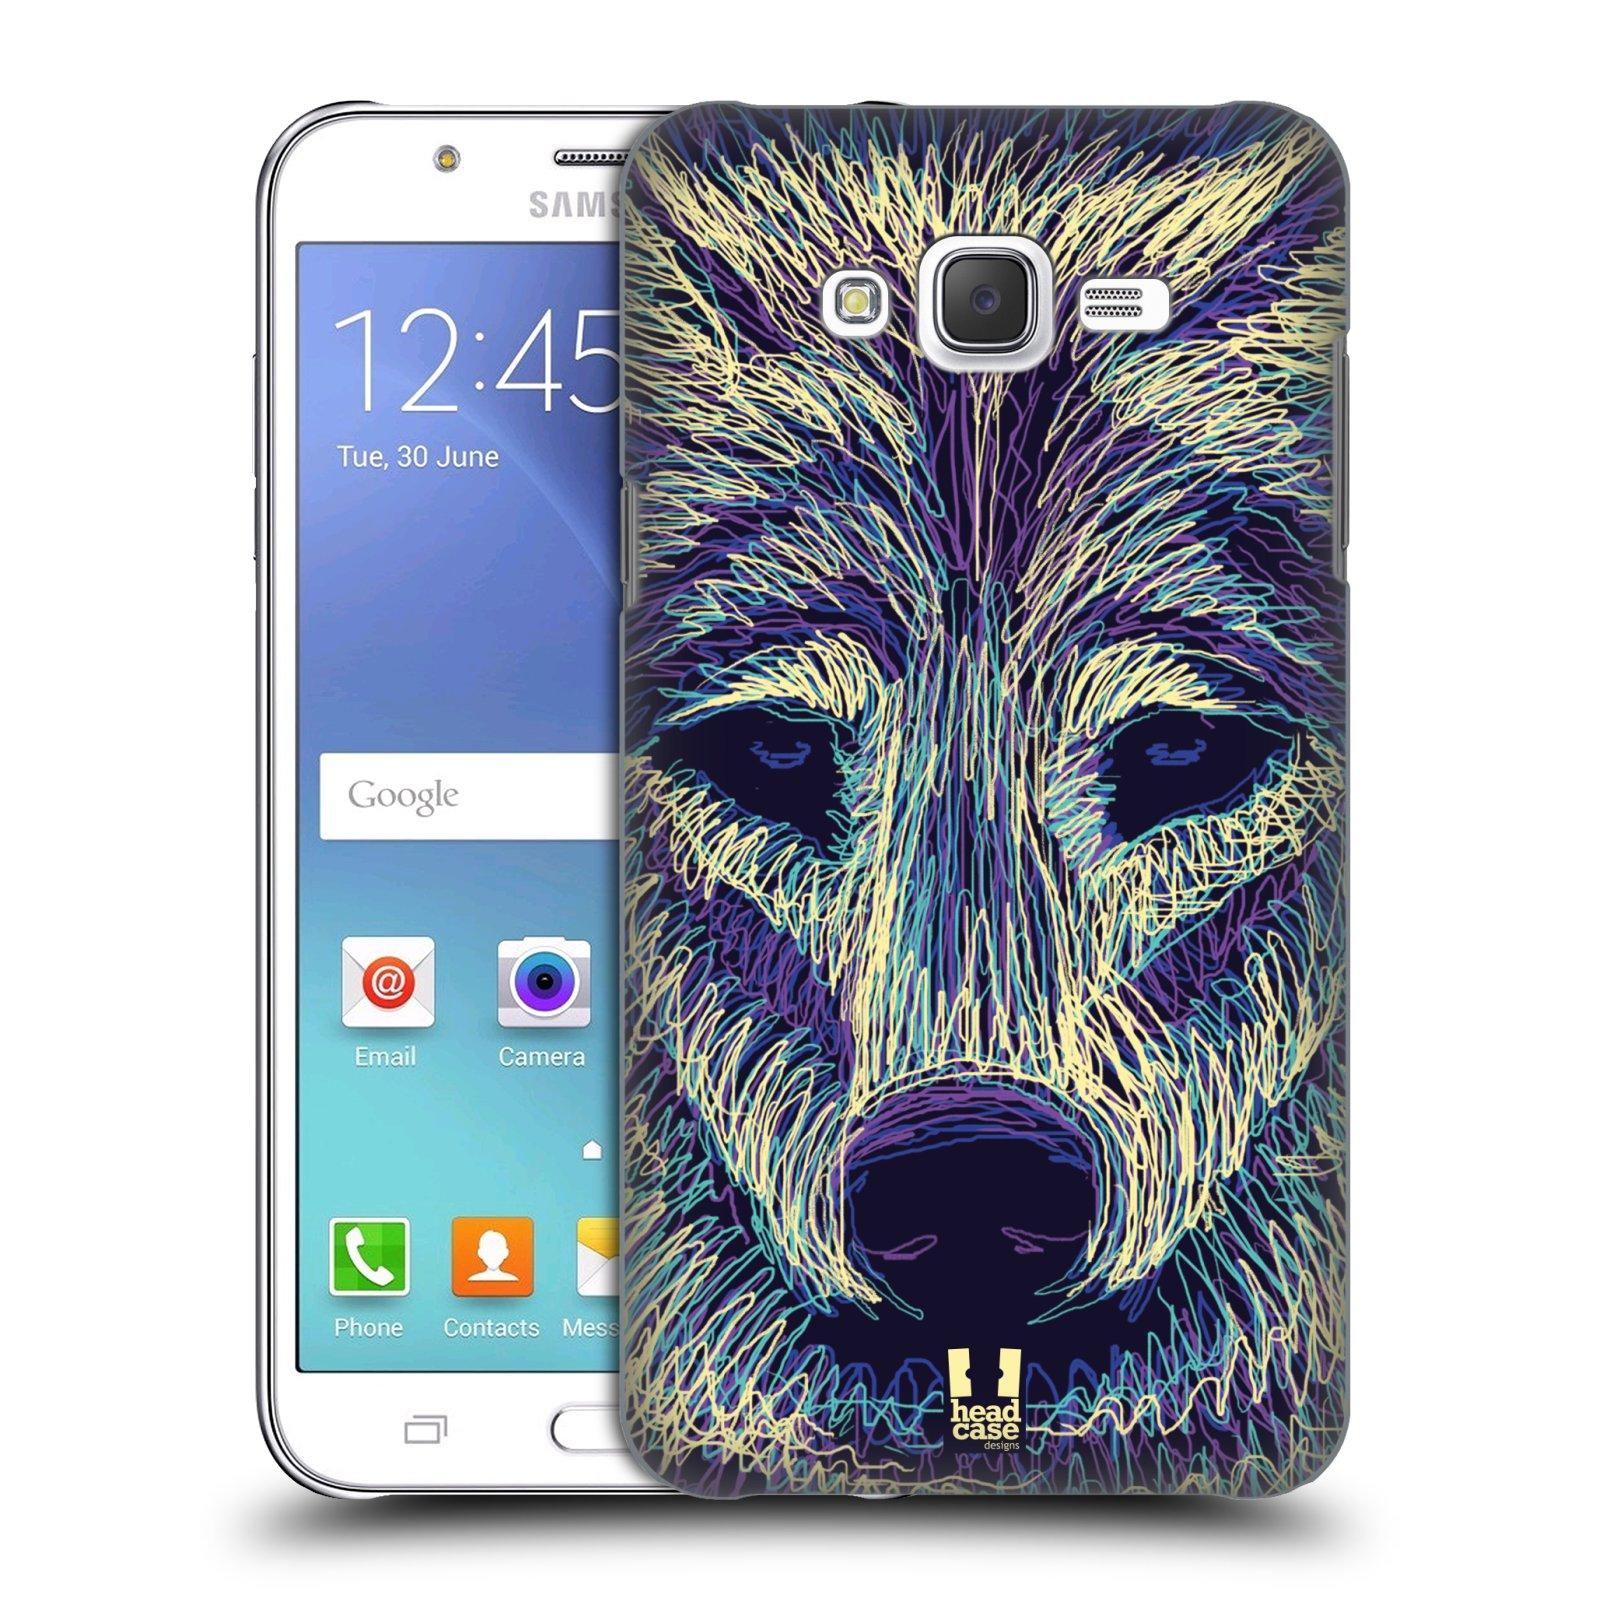 HEAD CASE plastový obal na mobil SAMSUNG Galaxy J7, J700 vzor zvíře čmáranice vlk